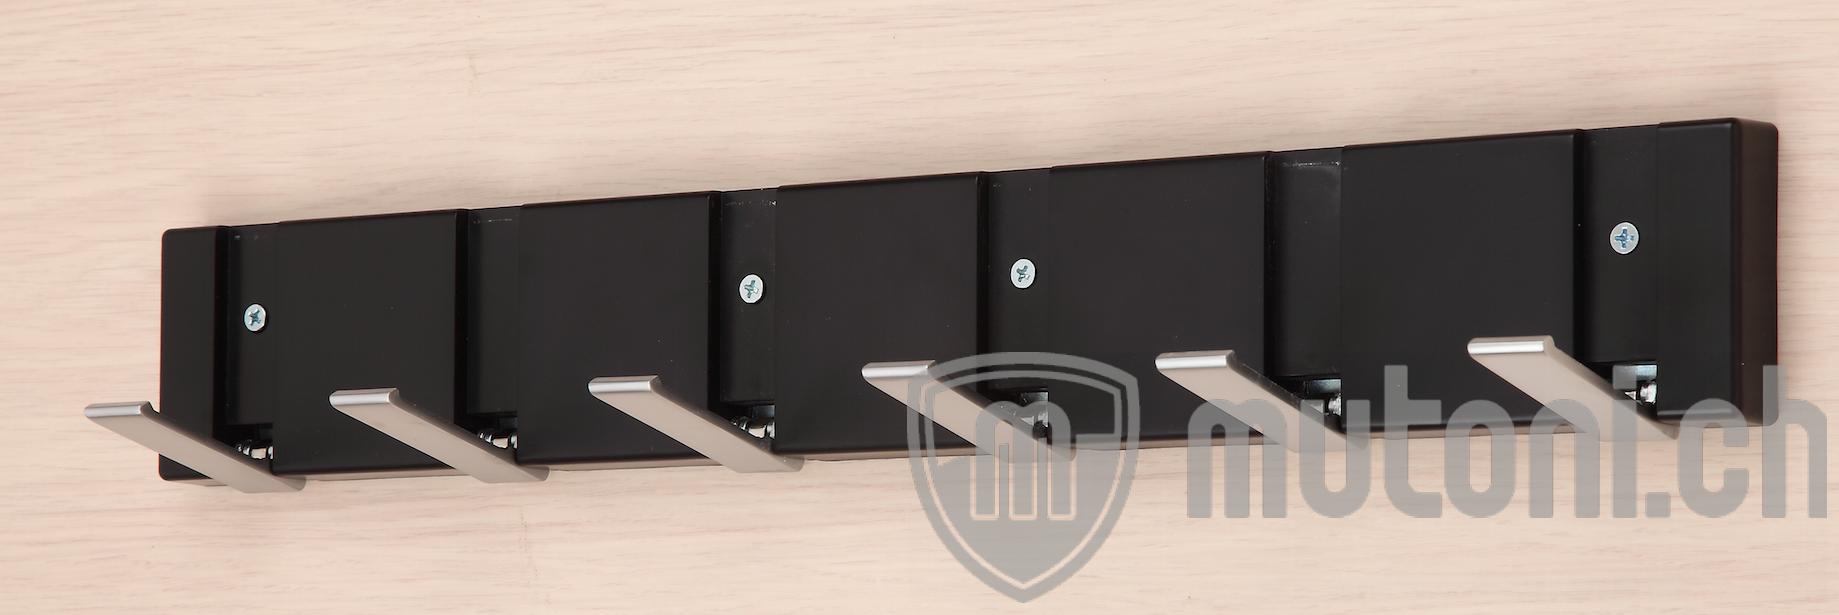 wandgarderobe bueno 48cm schwarz mutoni design mutoni. Black Bedroom Furniture Sets. Home Design Ideas